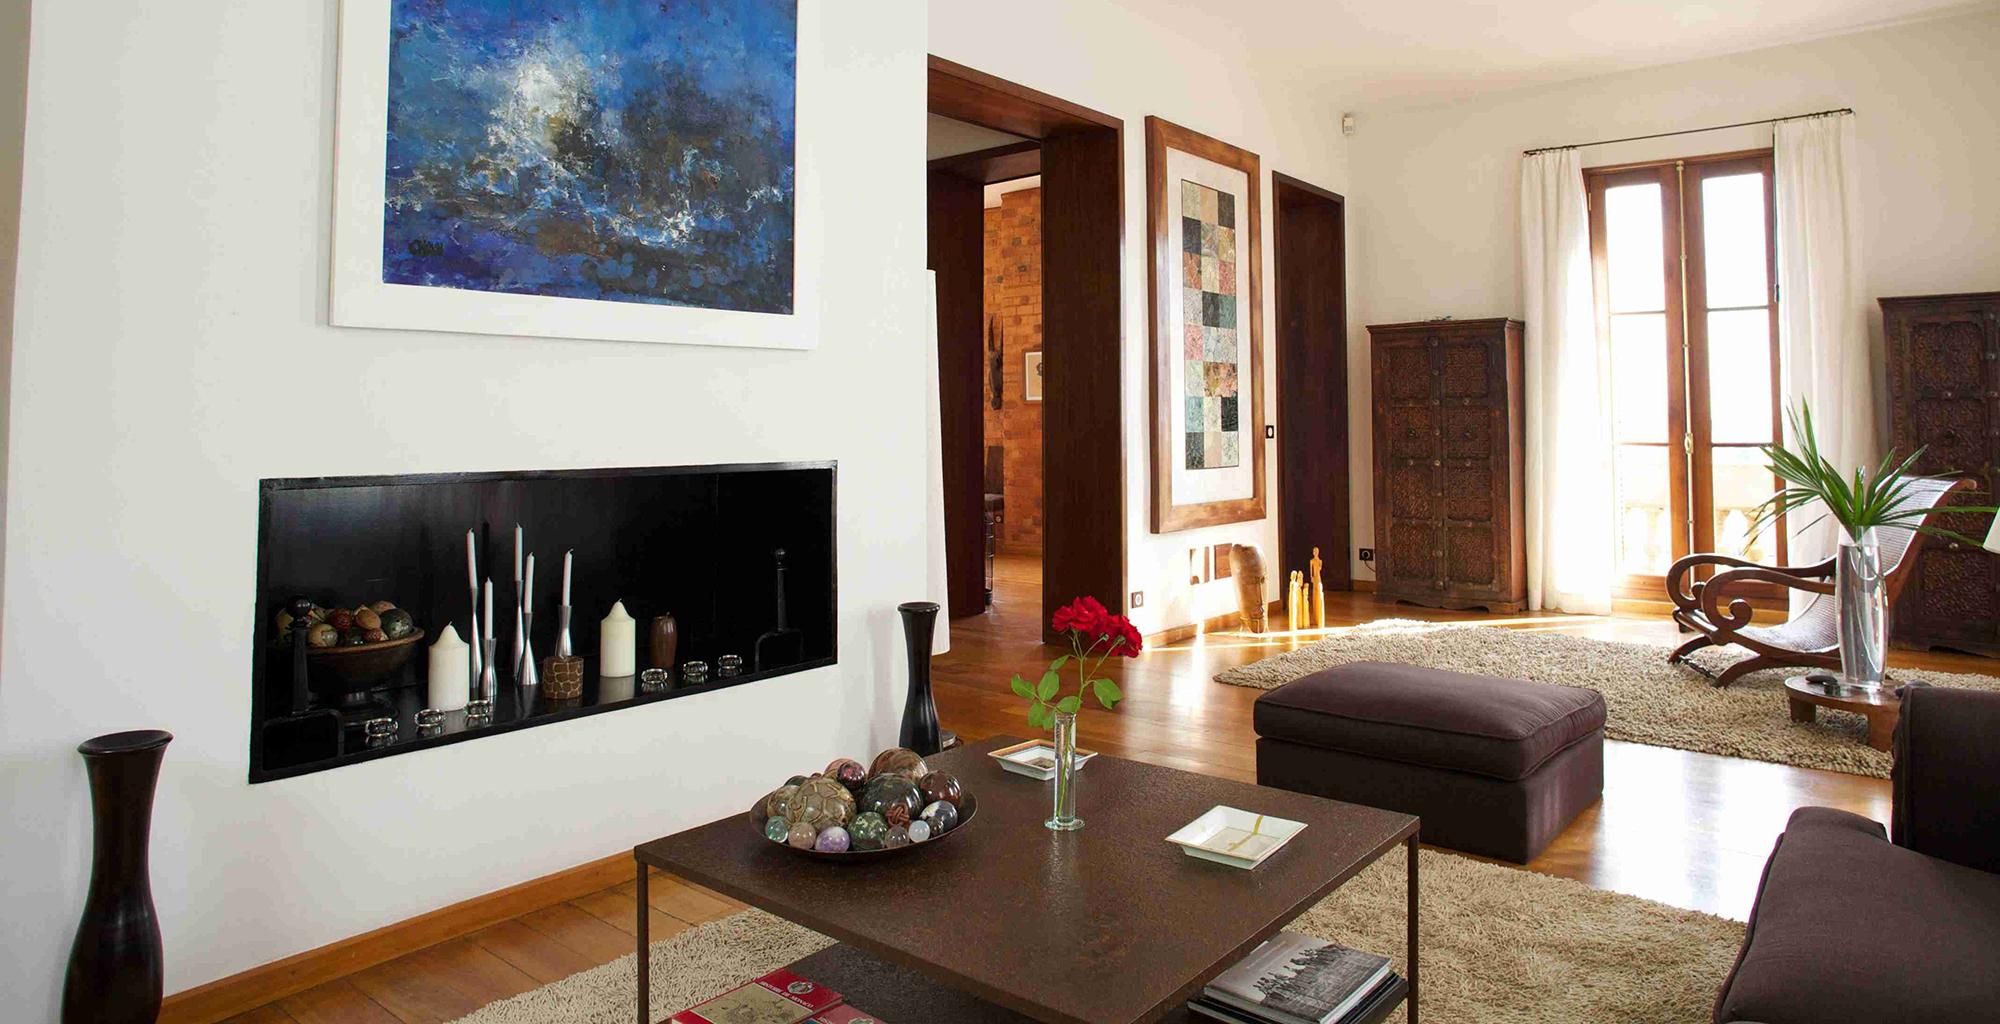 Madagascar-Maison-Gallieni-Living-Room